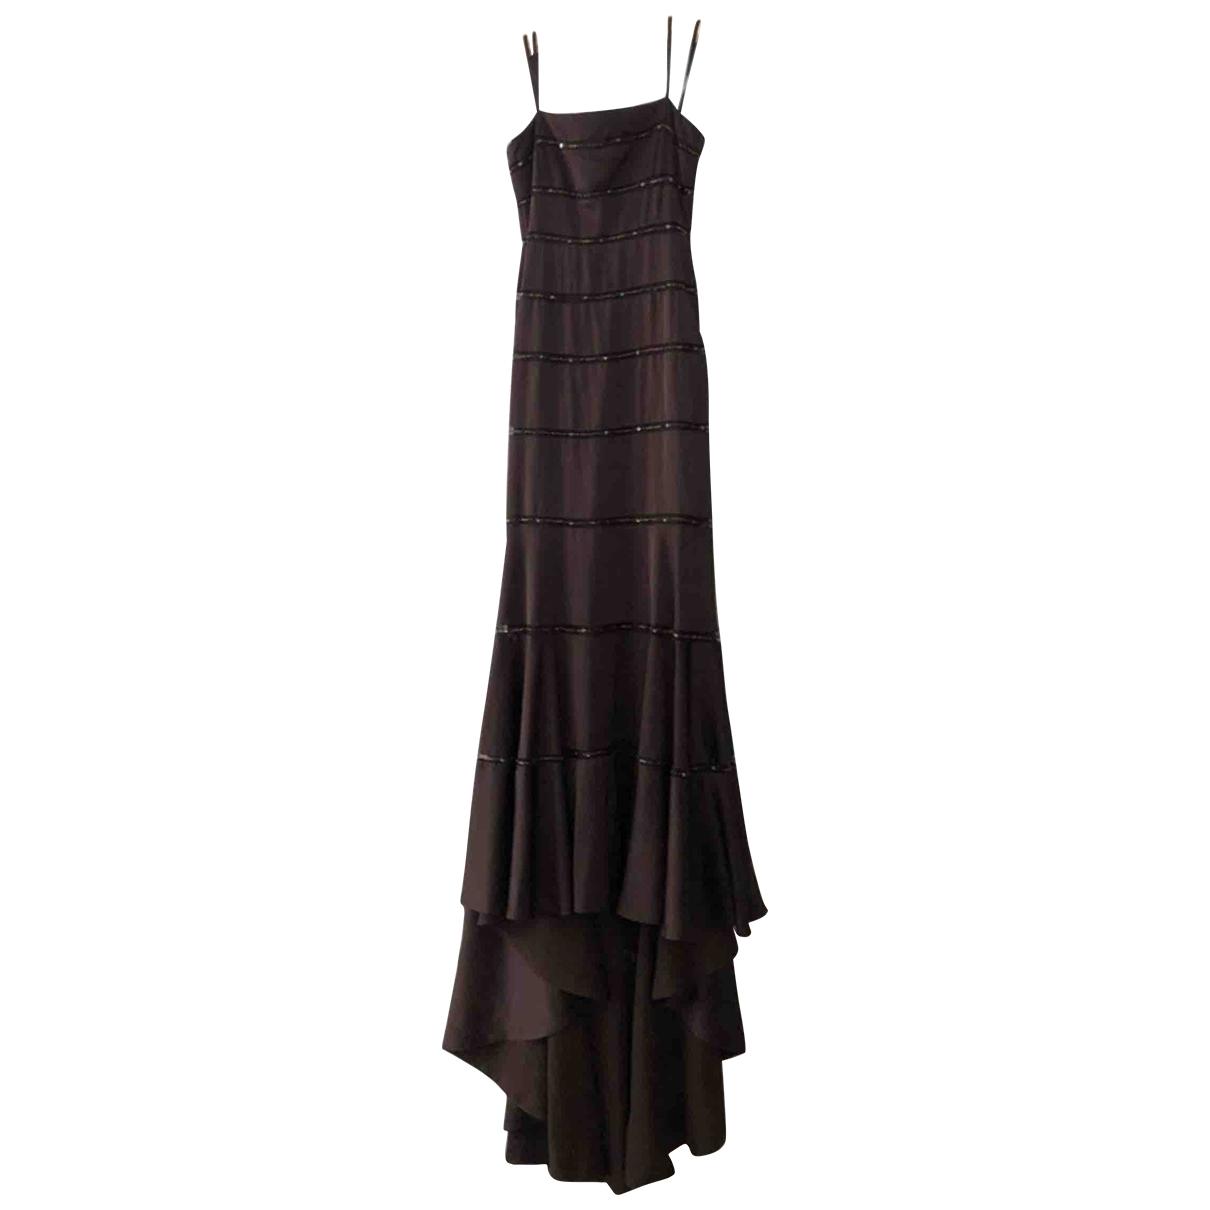 Bcbg Max Azria \N Brown dress for Women 6 US